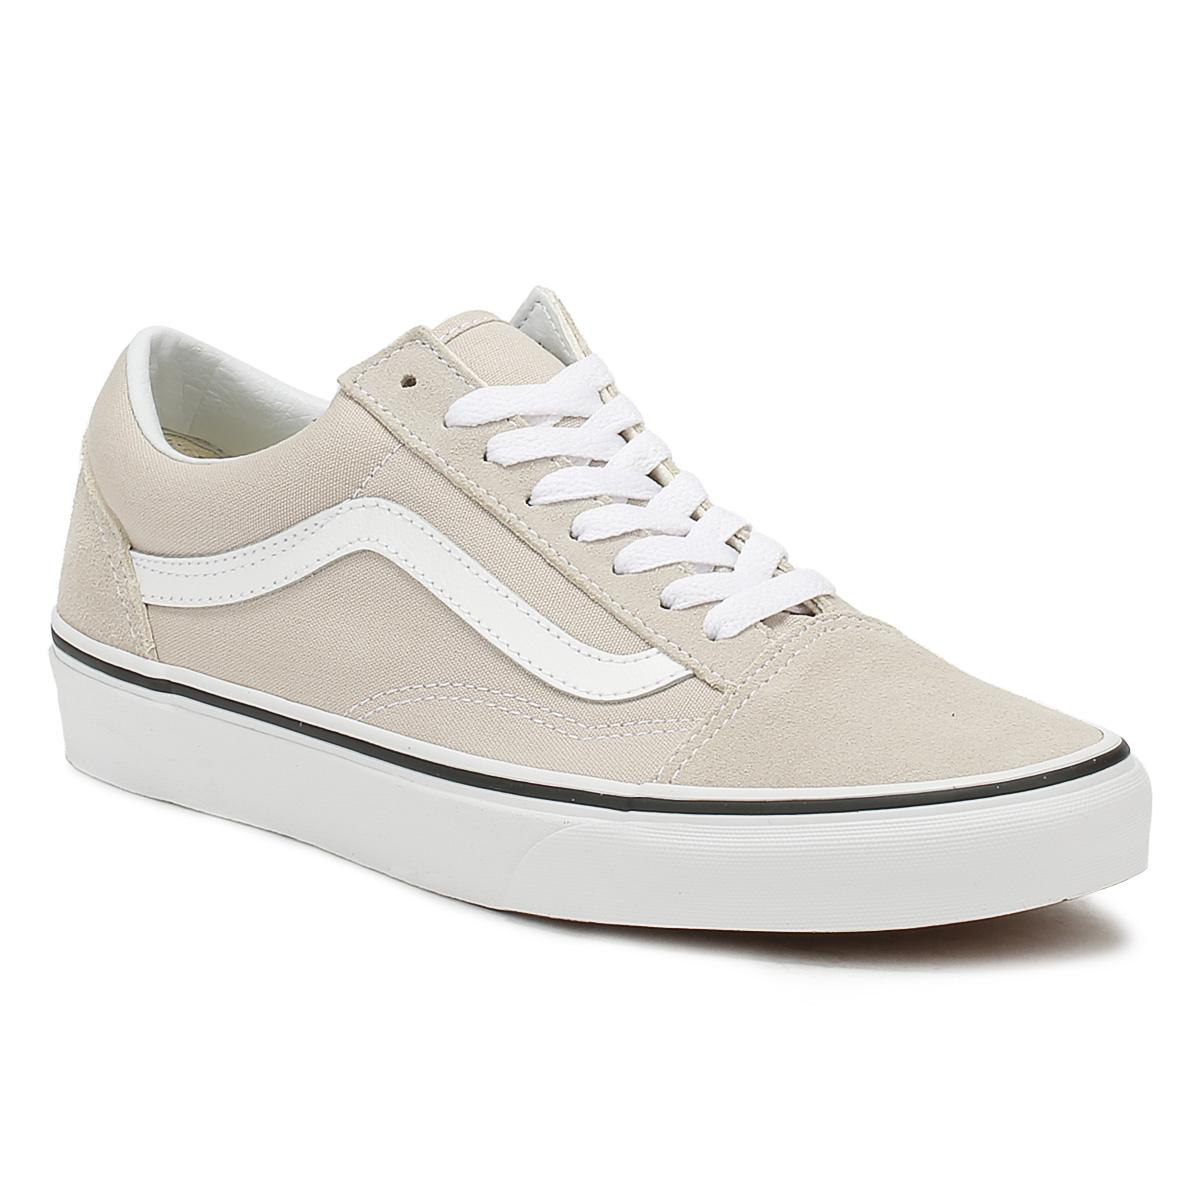 Vans Vans Vans Unisex Plata Lining & True Blanco Old Skool Trainers Lace Up Skate Zapatos ef75ce